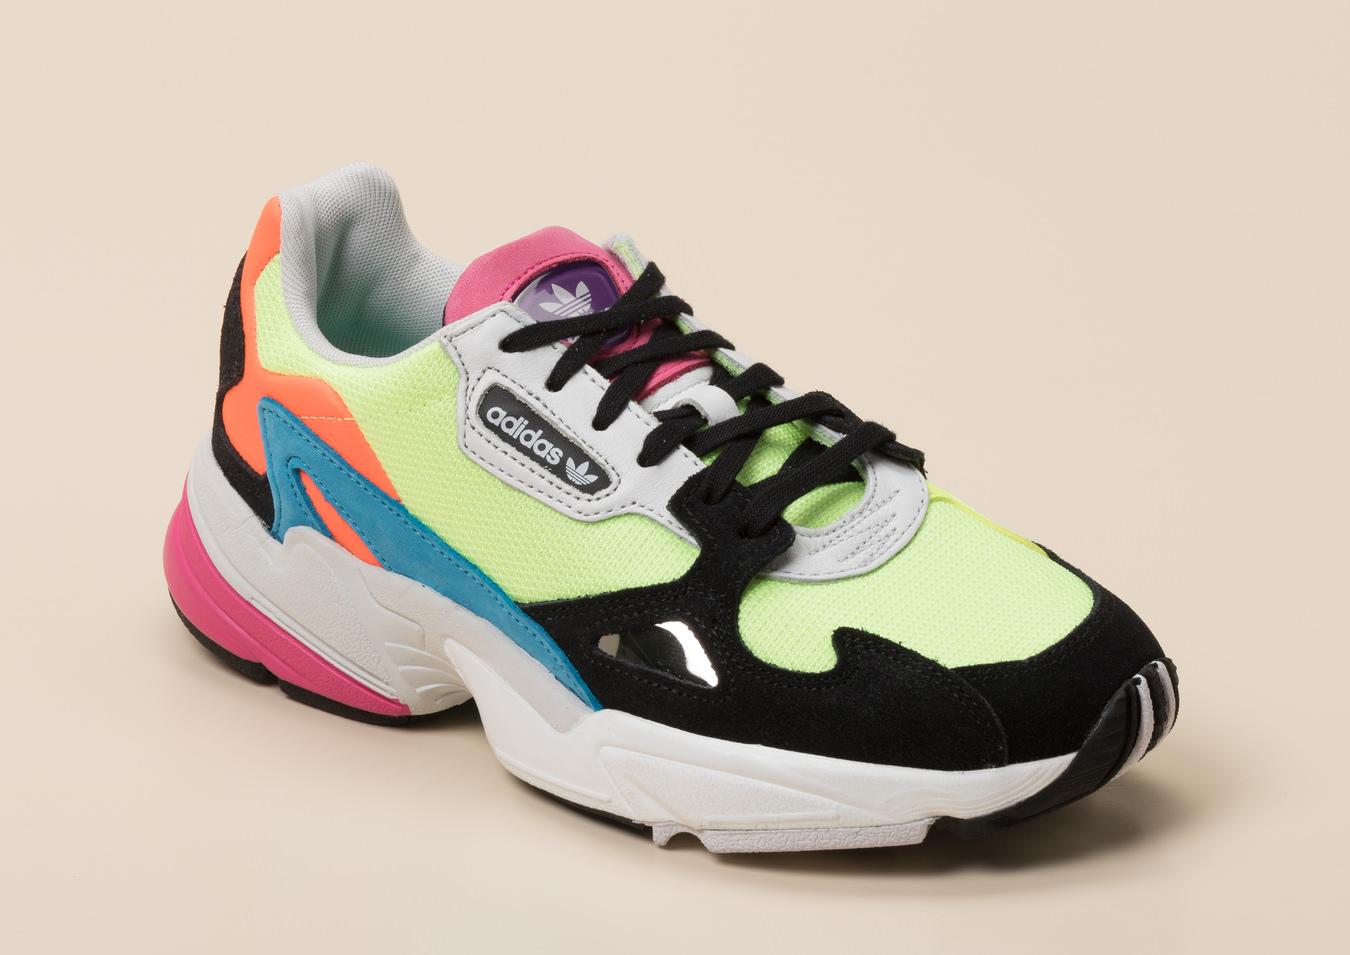 da41f427ec19d7 Adidas Damen Sneaker in multi bunt kaufen